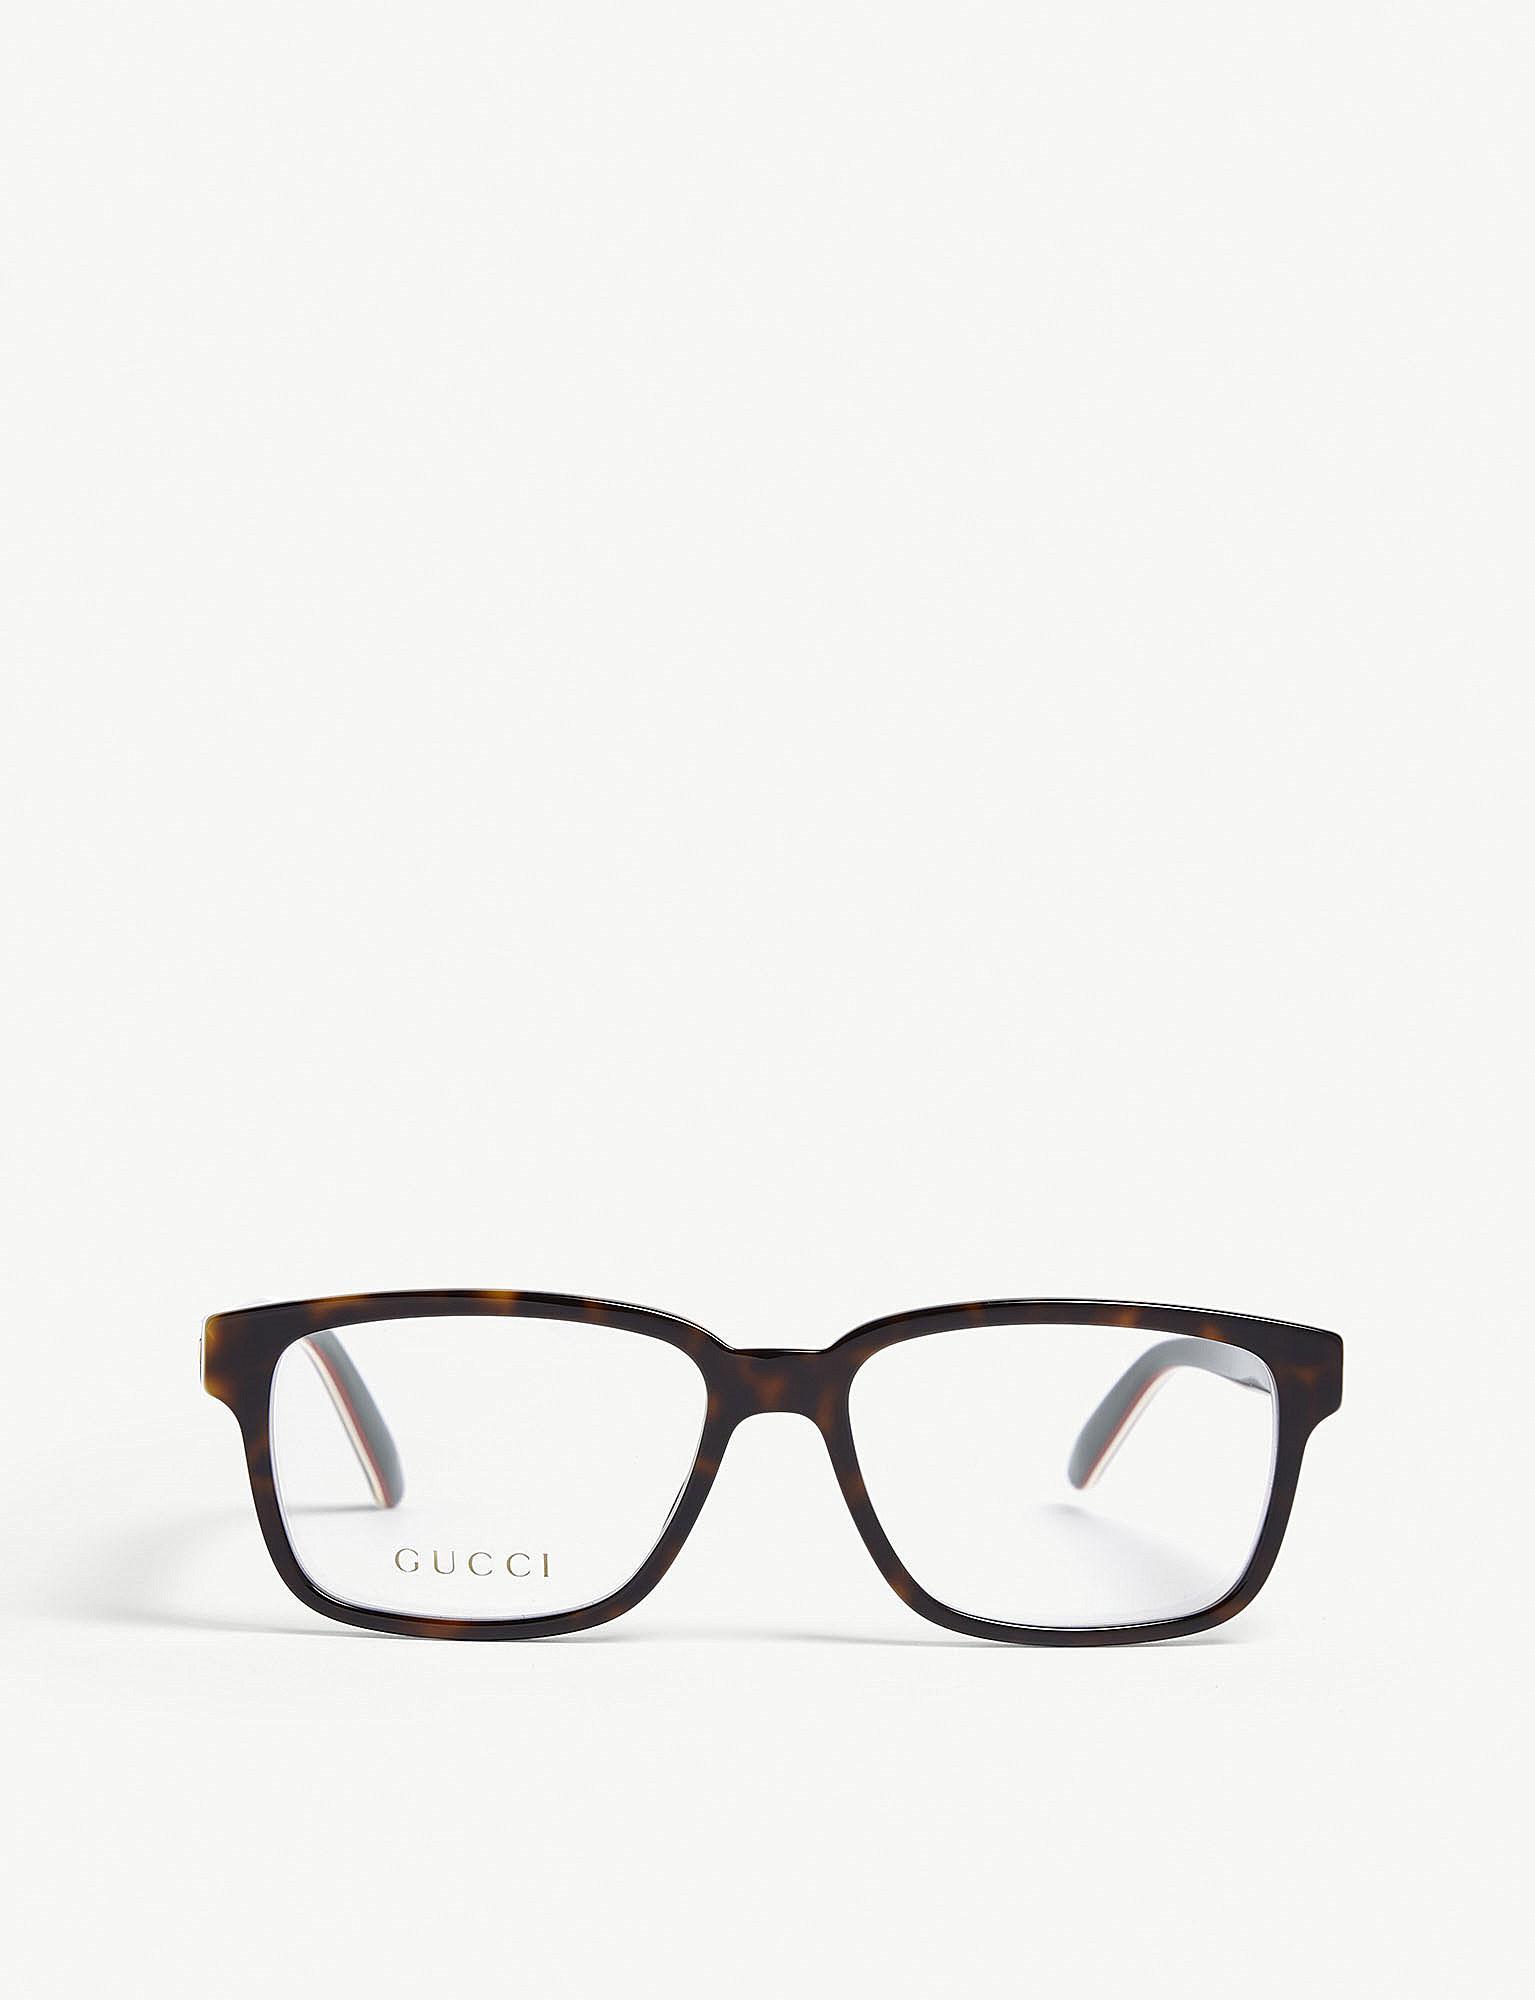 af7be512c38 Gucci - Black GG0272O Tortoiseshell Rectangle Glasses for Men - Lyst. View  fullscreen